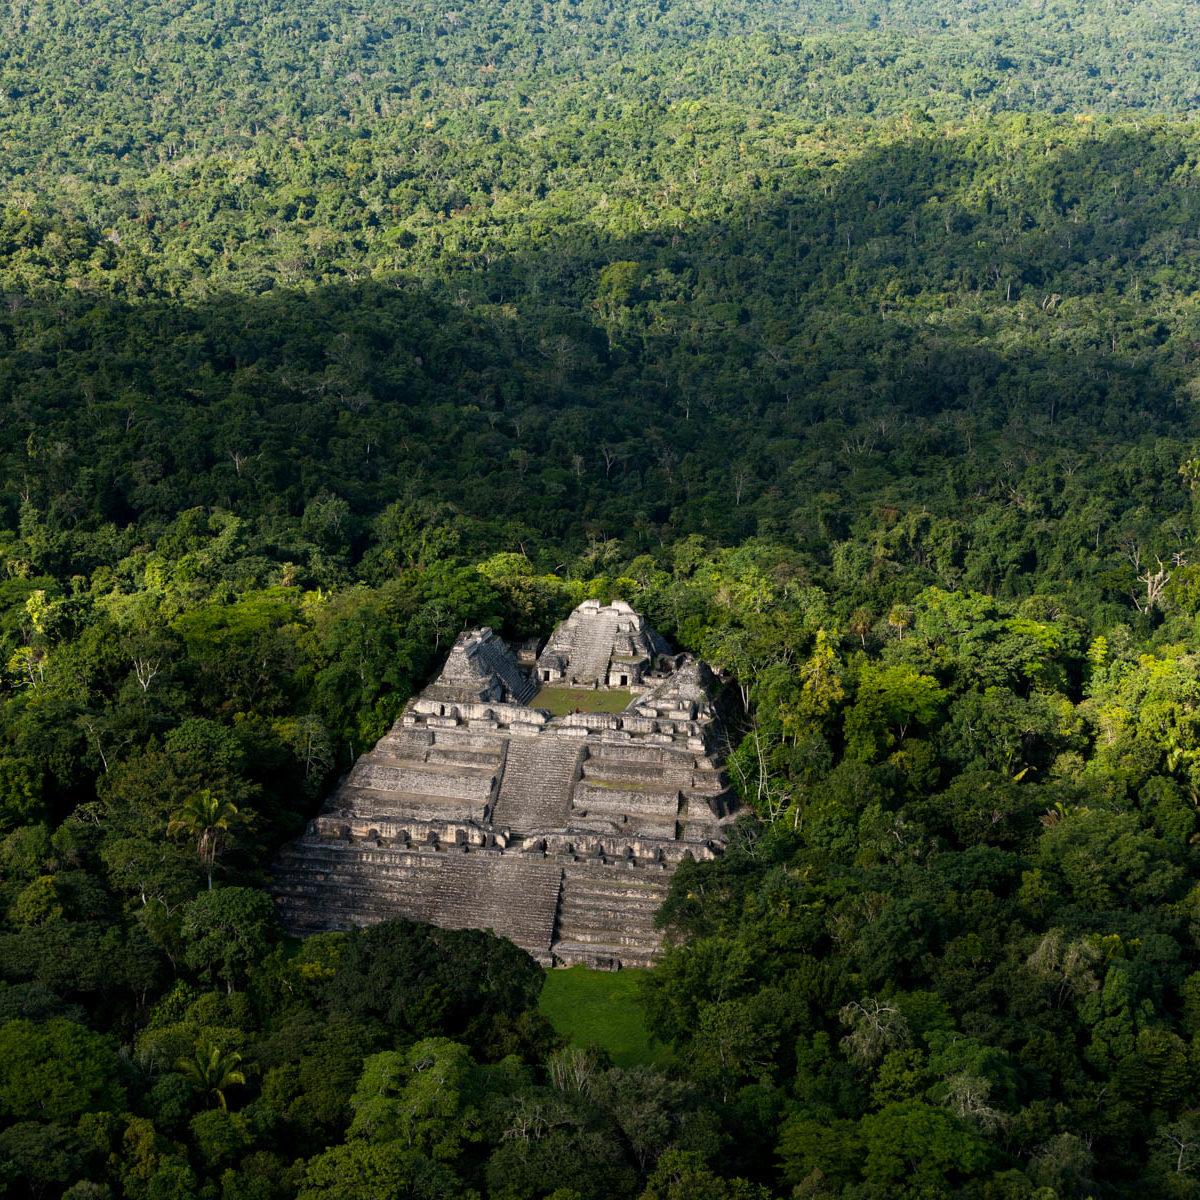 Temple maya Caana, site archéologique de Caracol, District de Cayo, Belize (16°46' N - 89°07' W) © Yann Arthus Bertrand